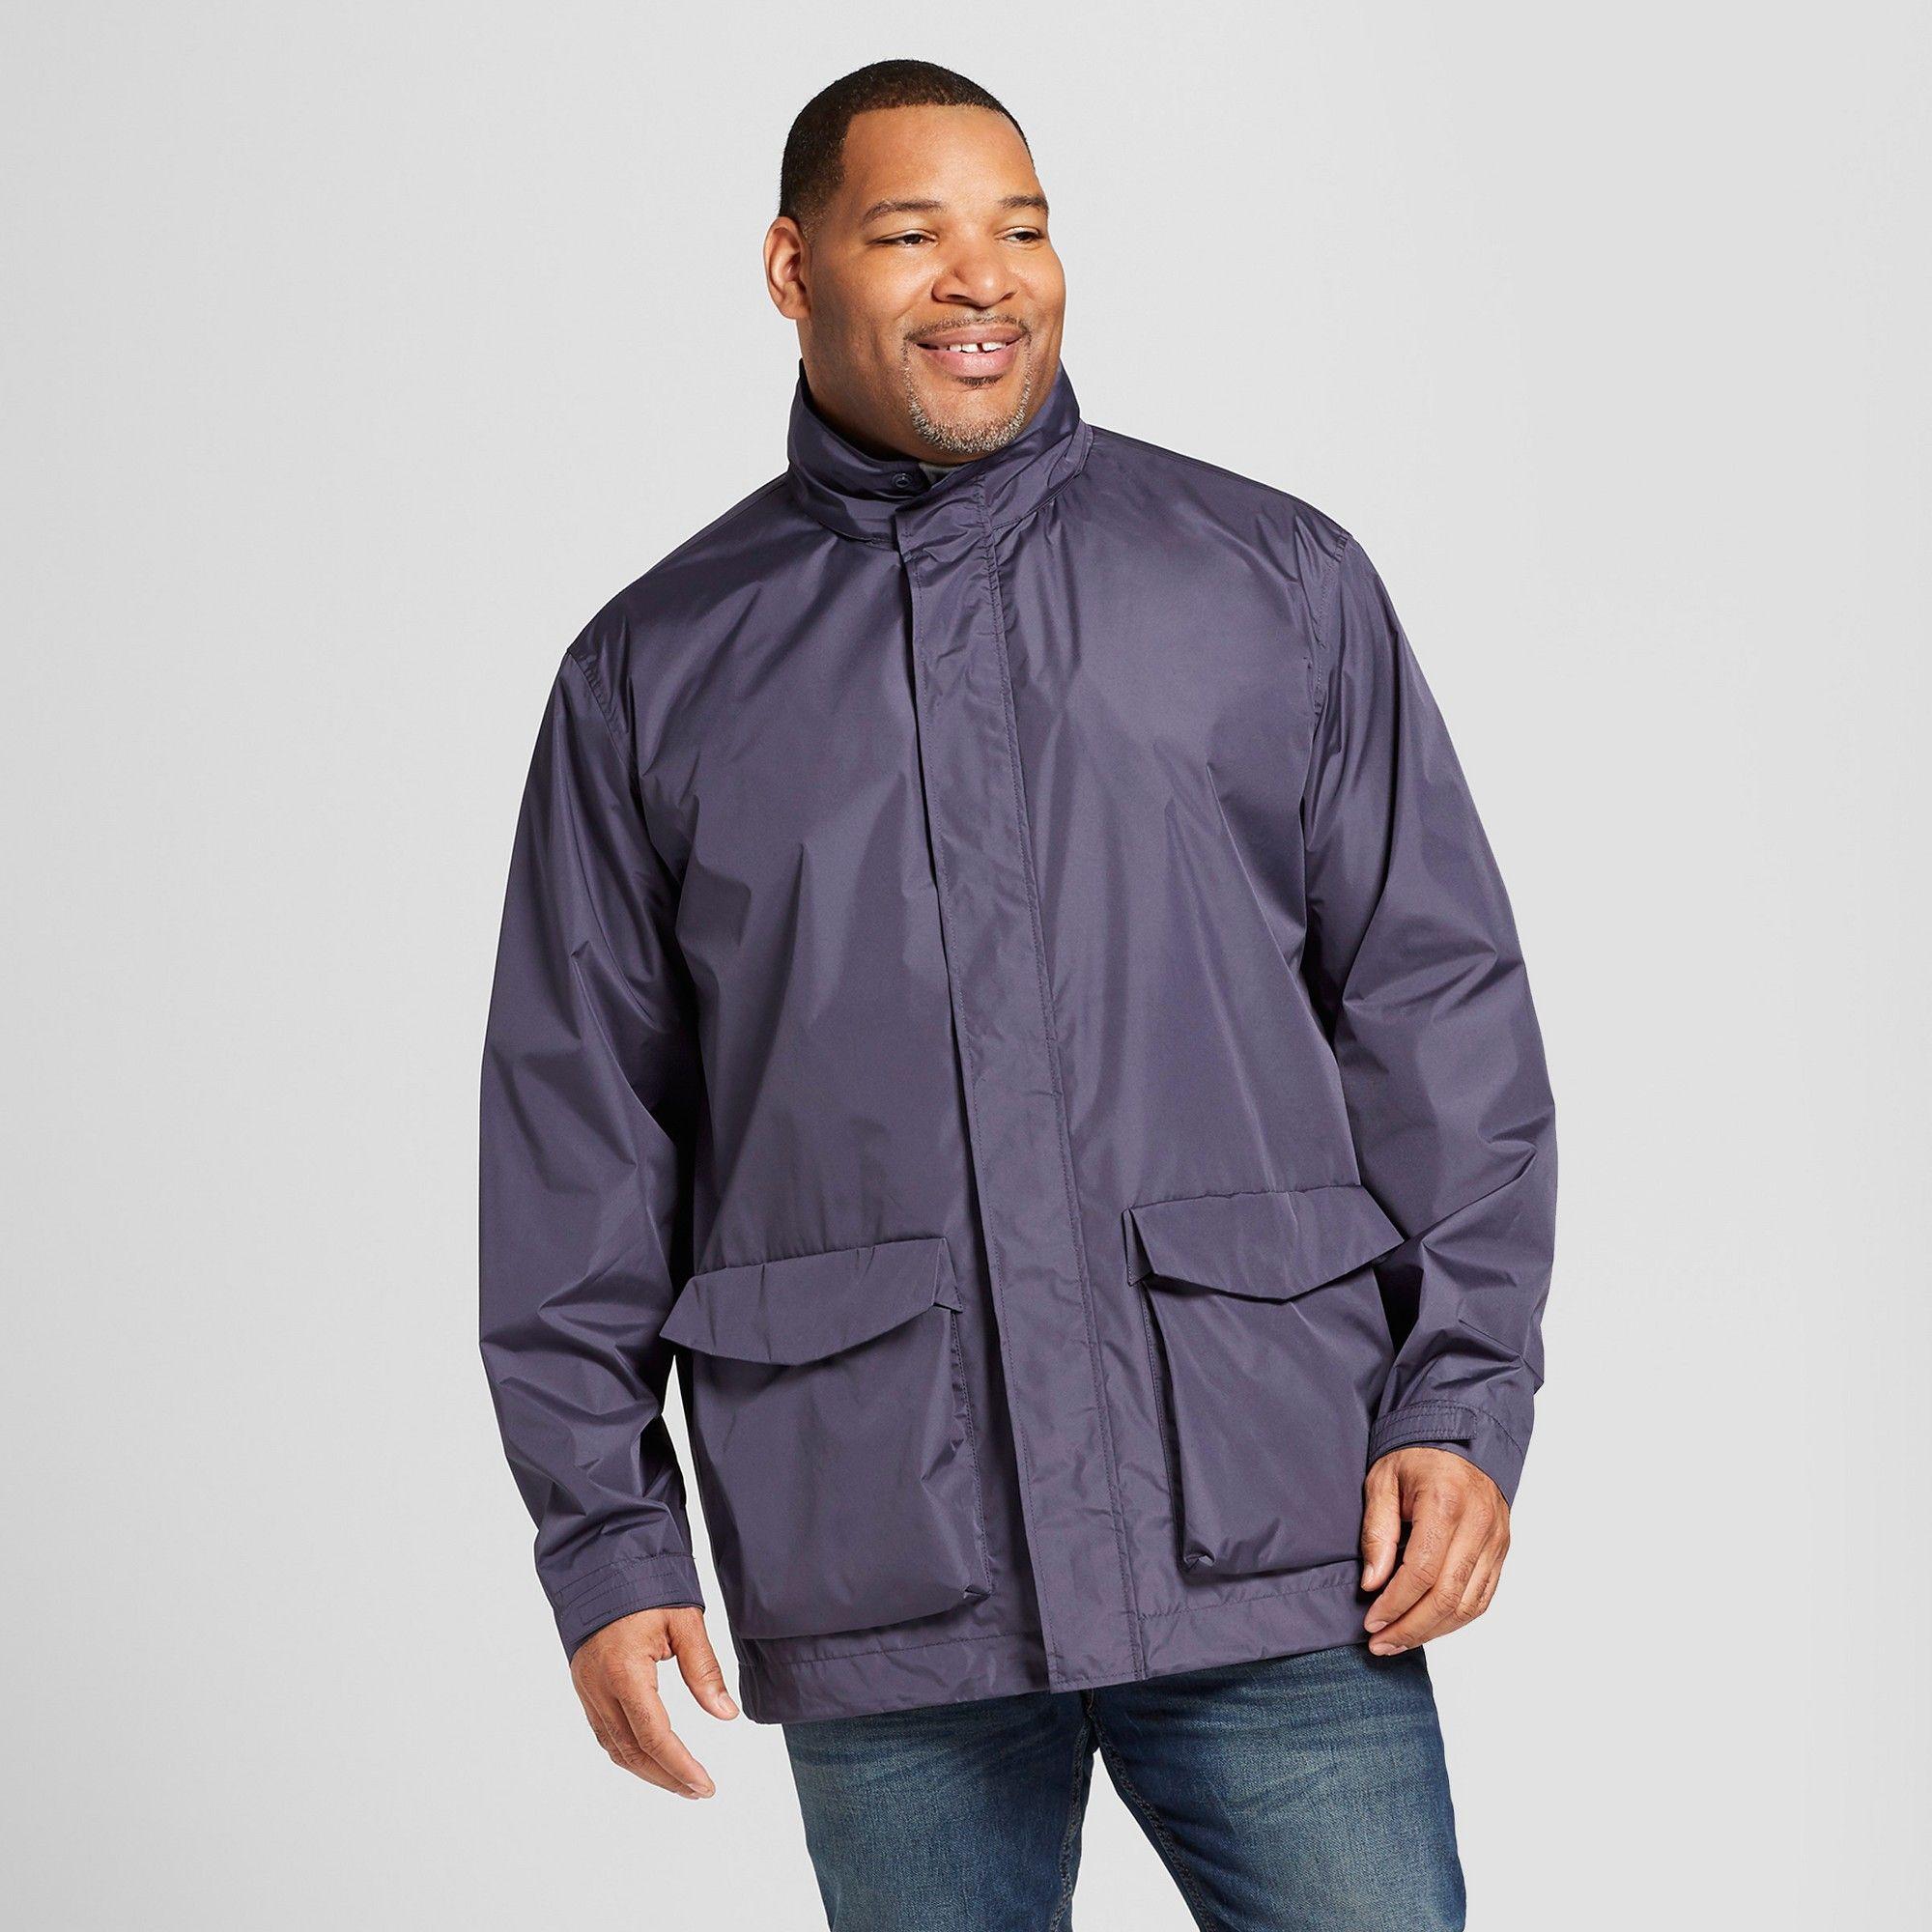 b4a2bdf0b Men's Big & Tall Rain Jacket - Goodfellow & Co Geneva Blue 2XB ...